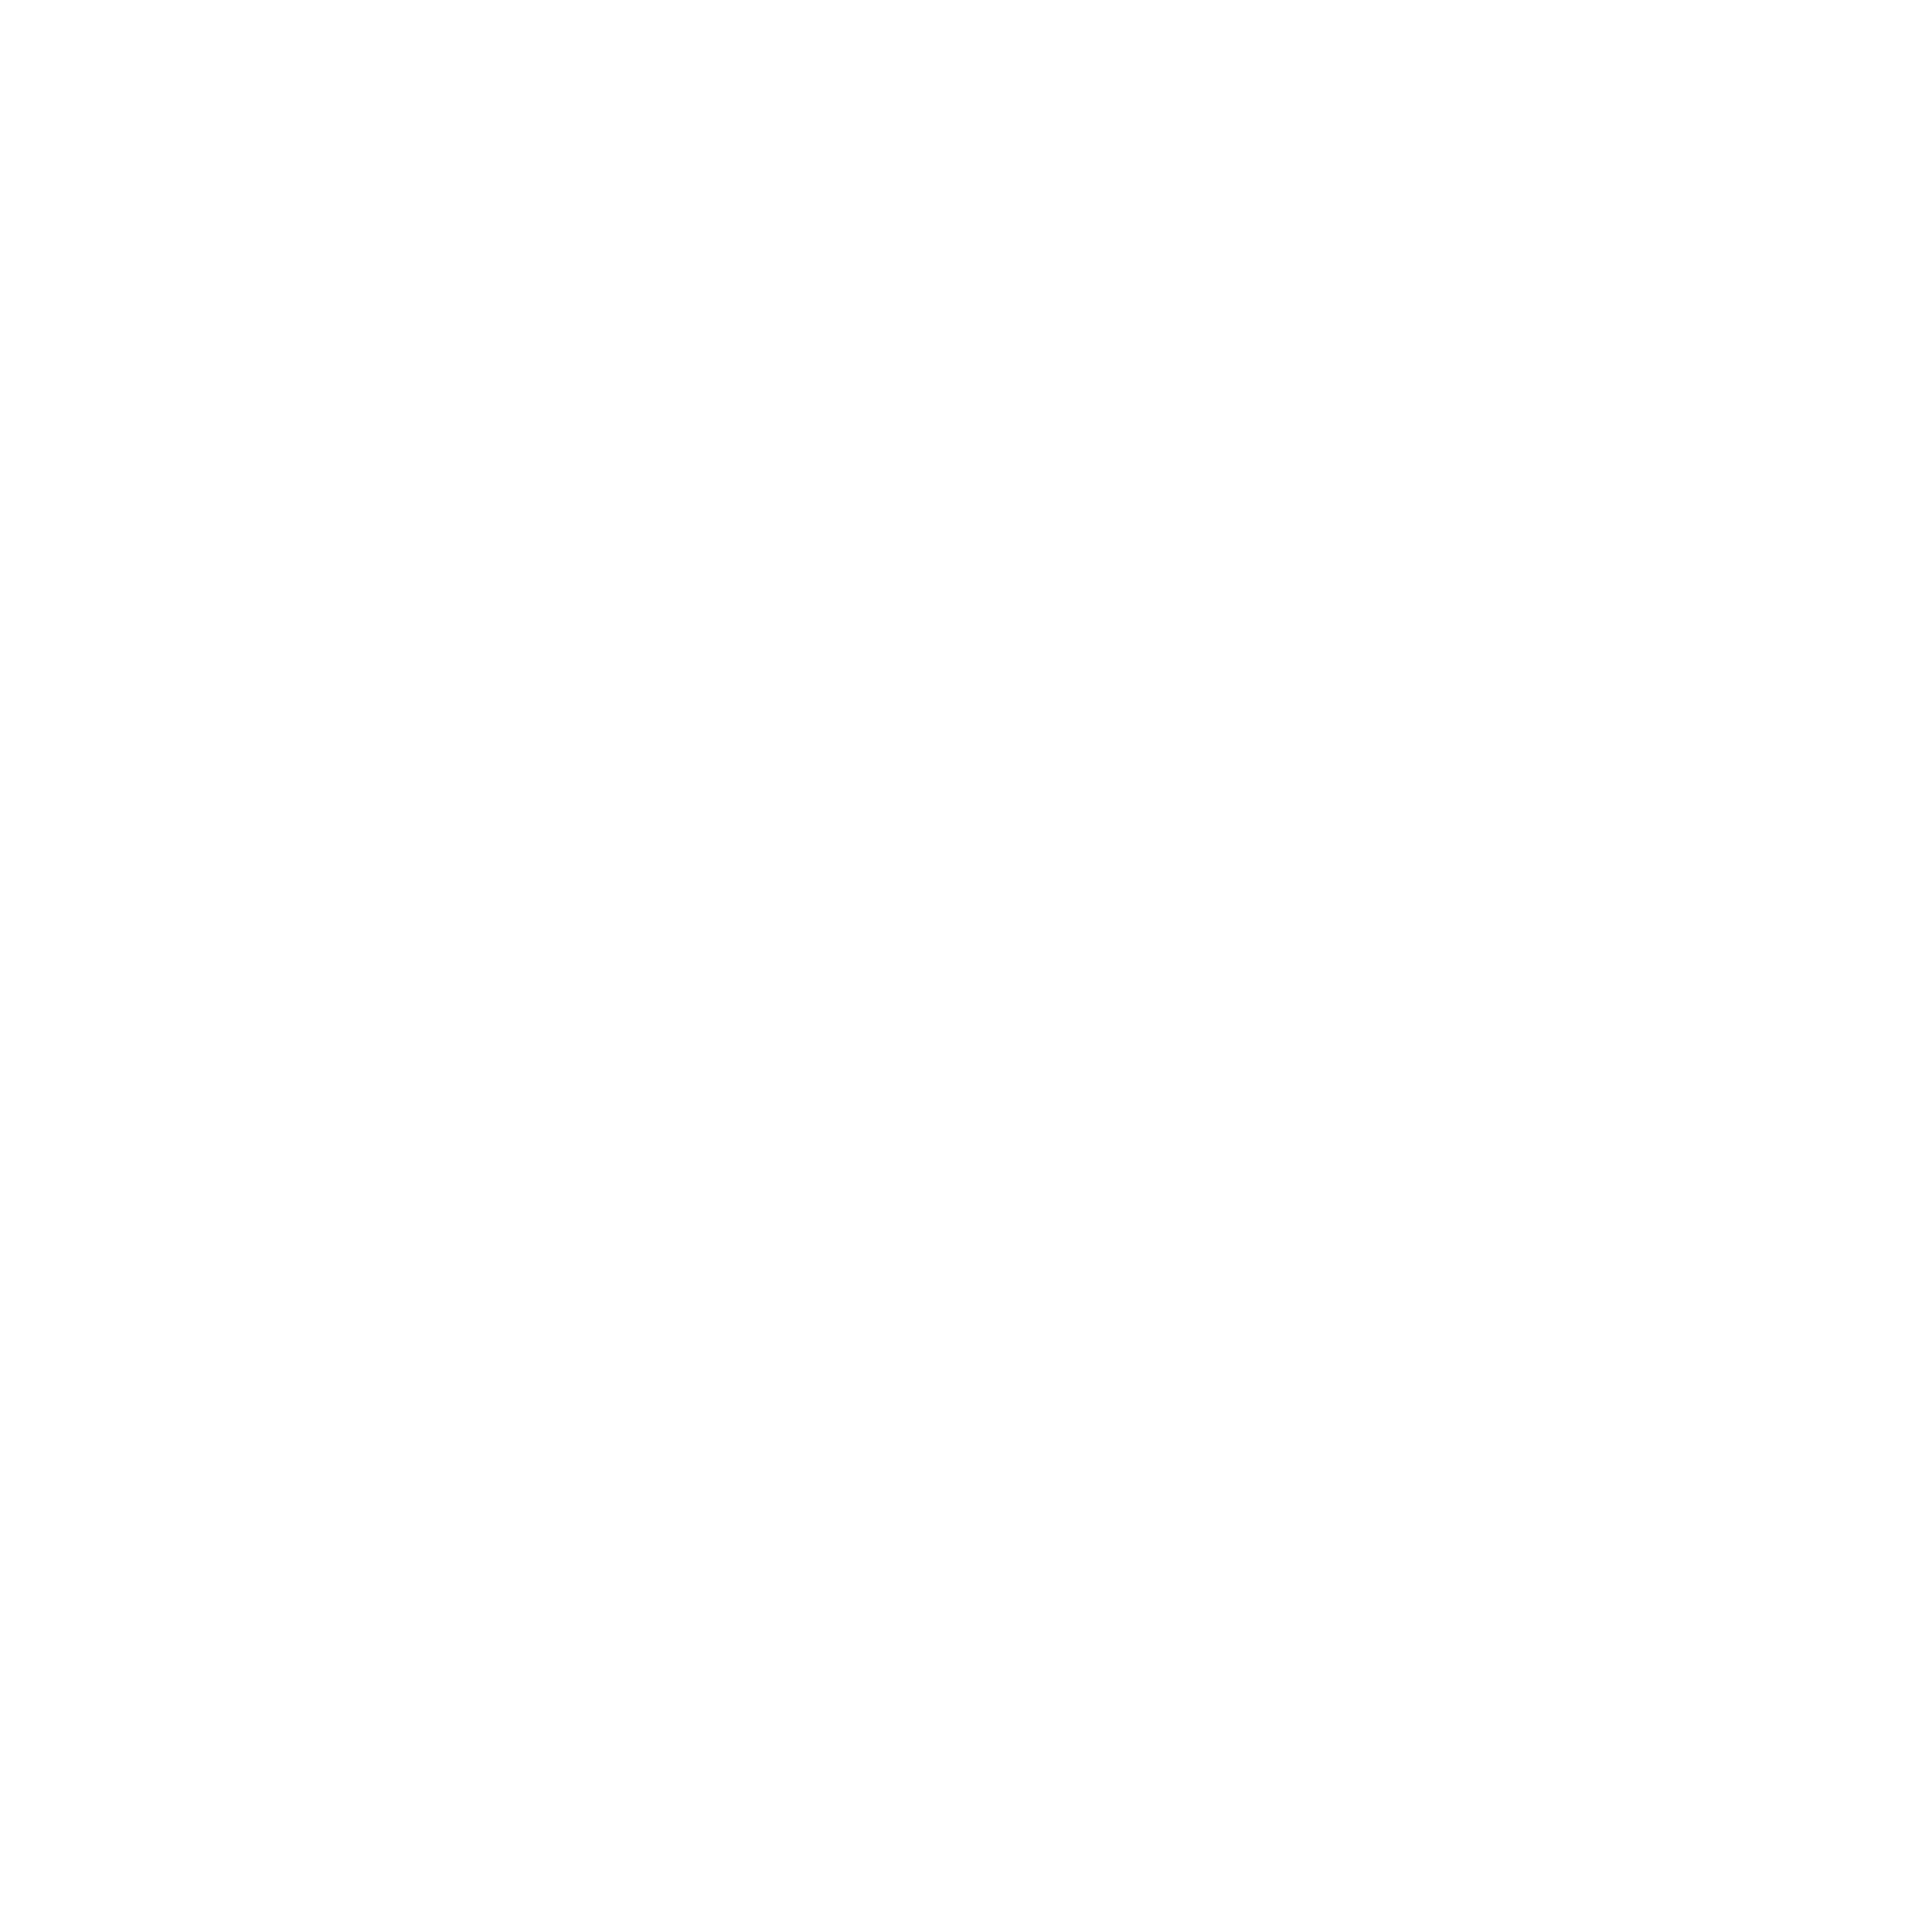 FOTOS-13